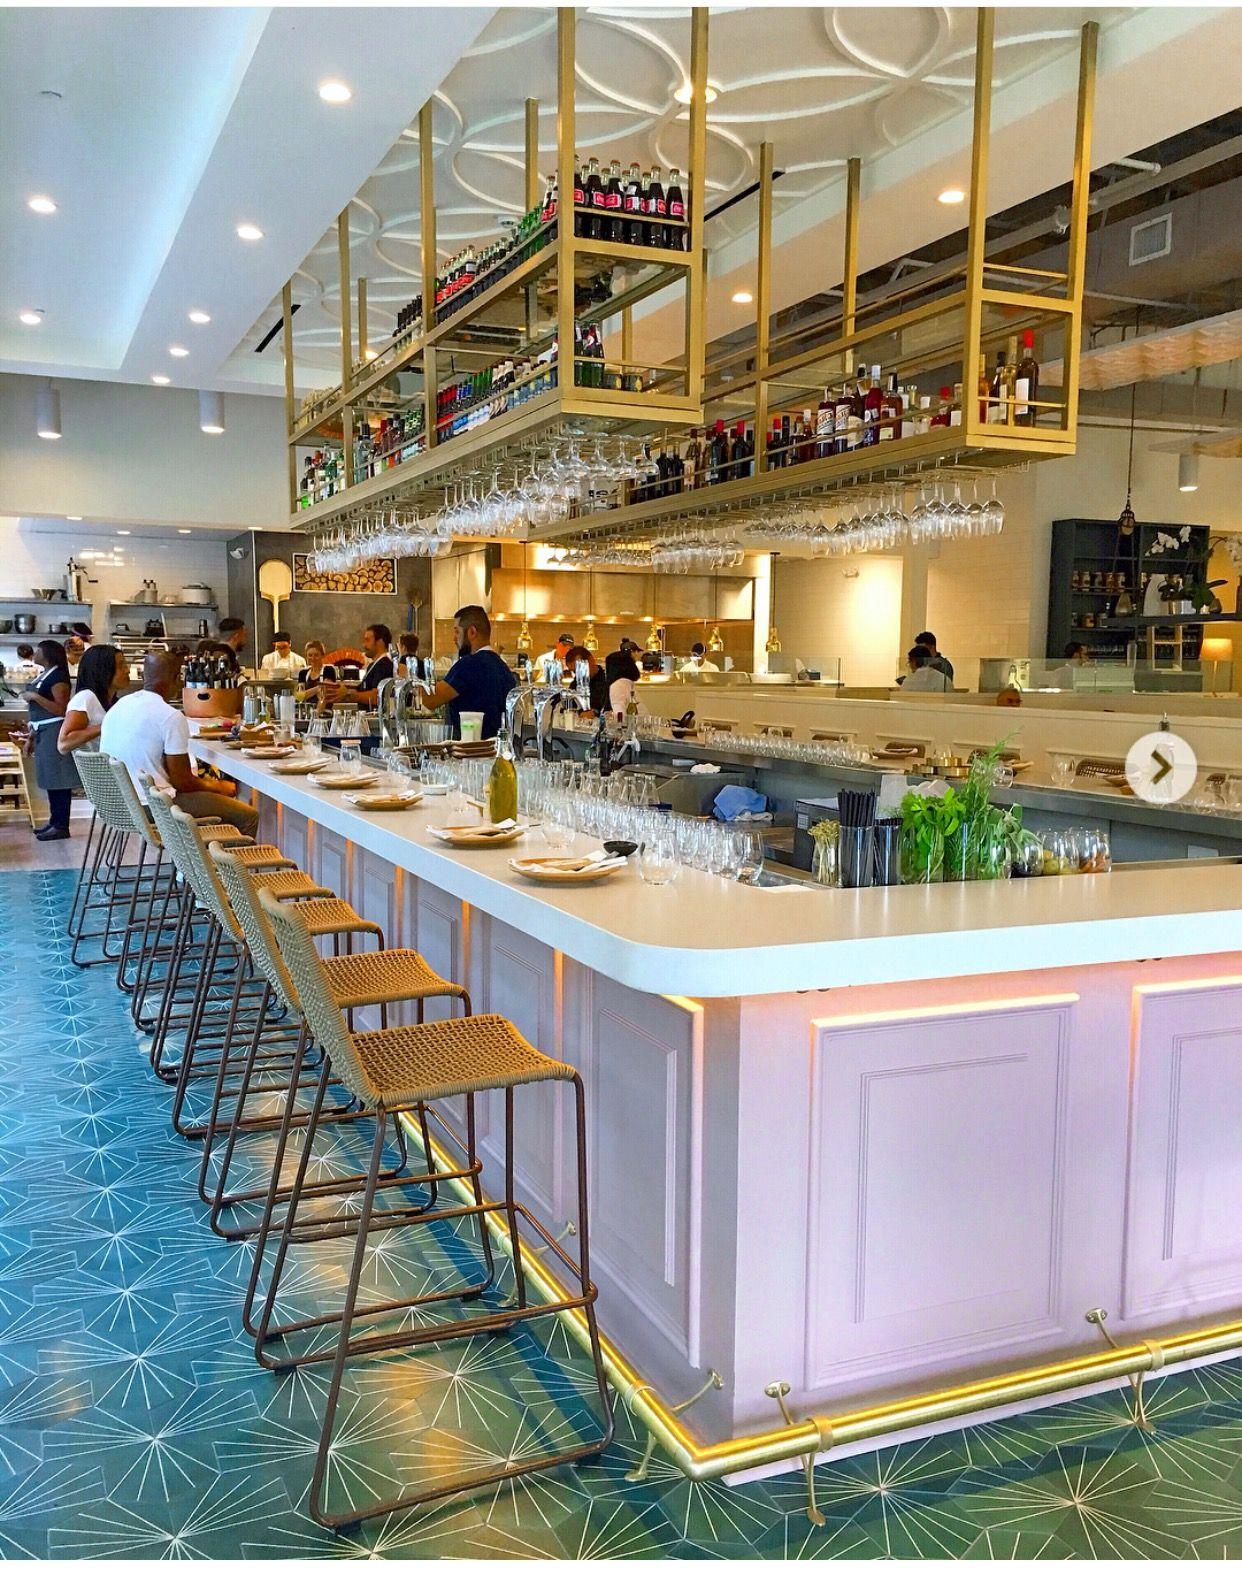 Sachet Restaurant Dallas, Texas | Restaurant interior ...